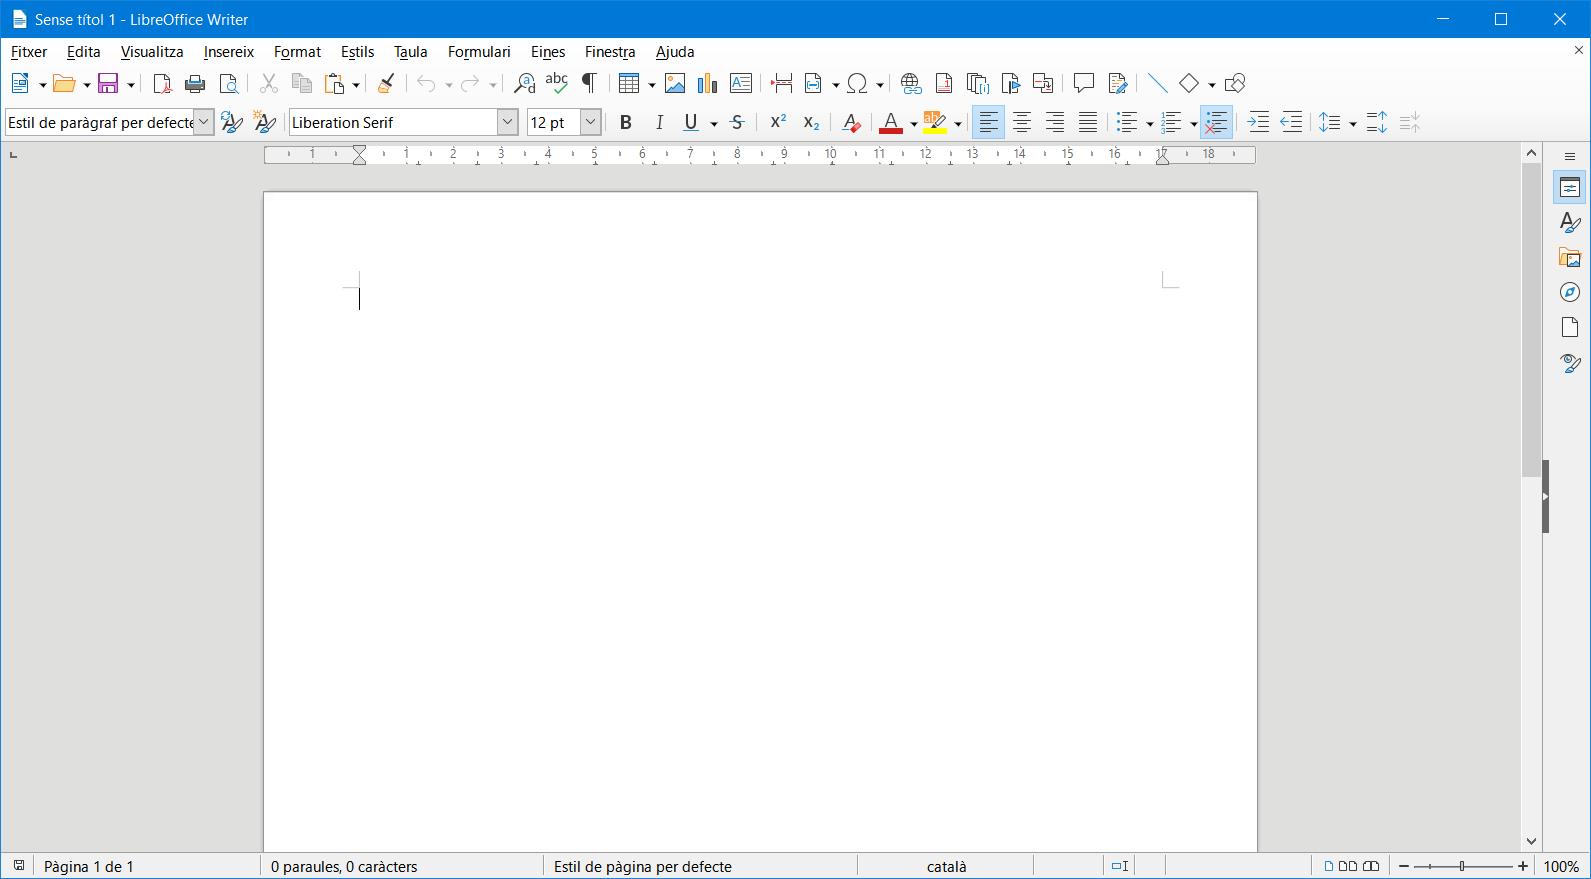 Imatge destacada 2 del LibreOffice